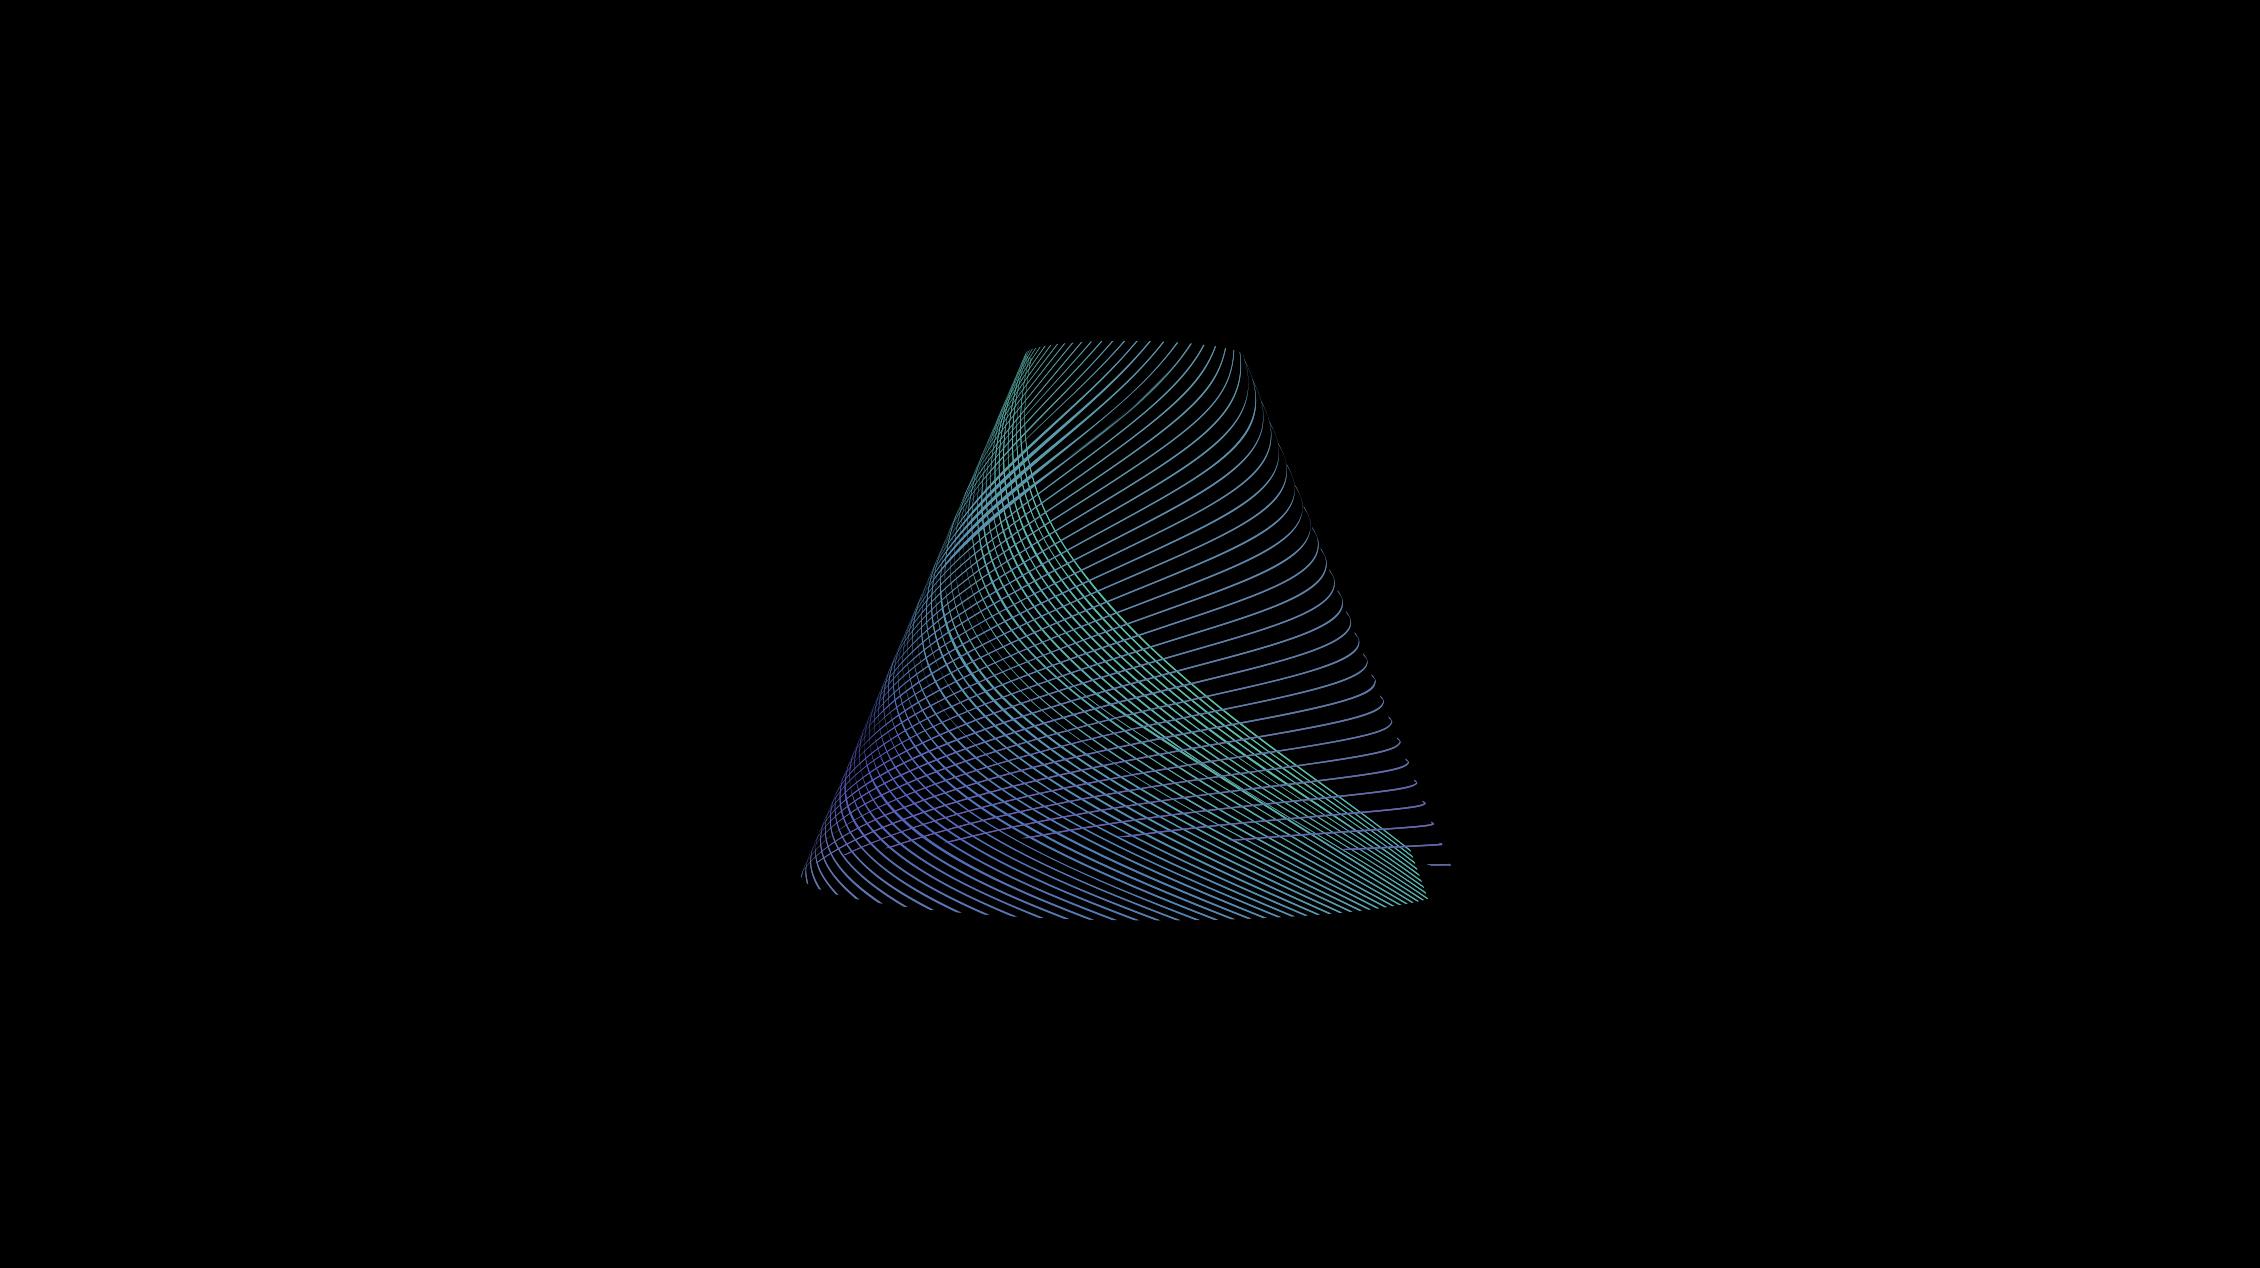 Pi_Web_Lines_v1.jpg